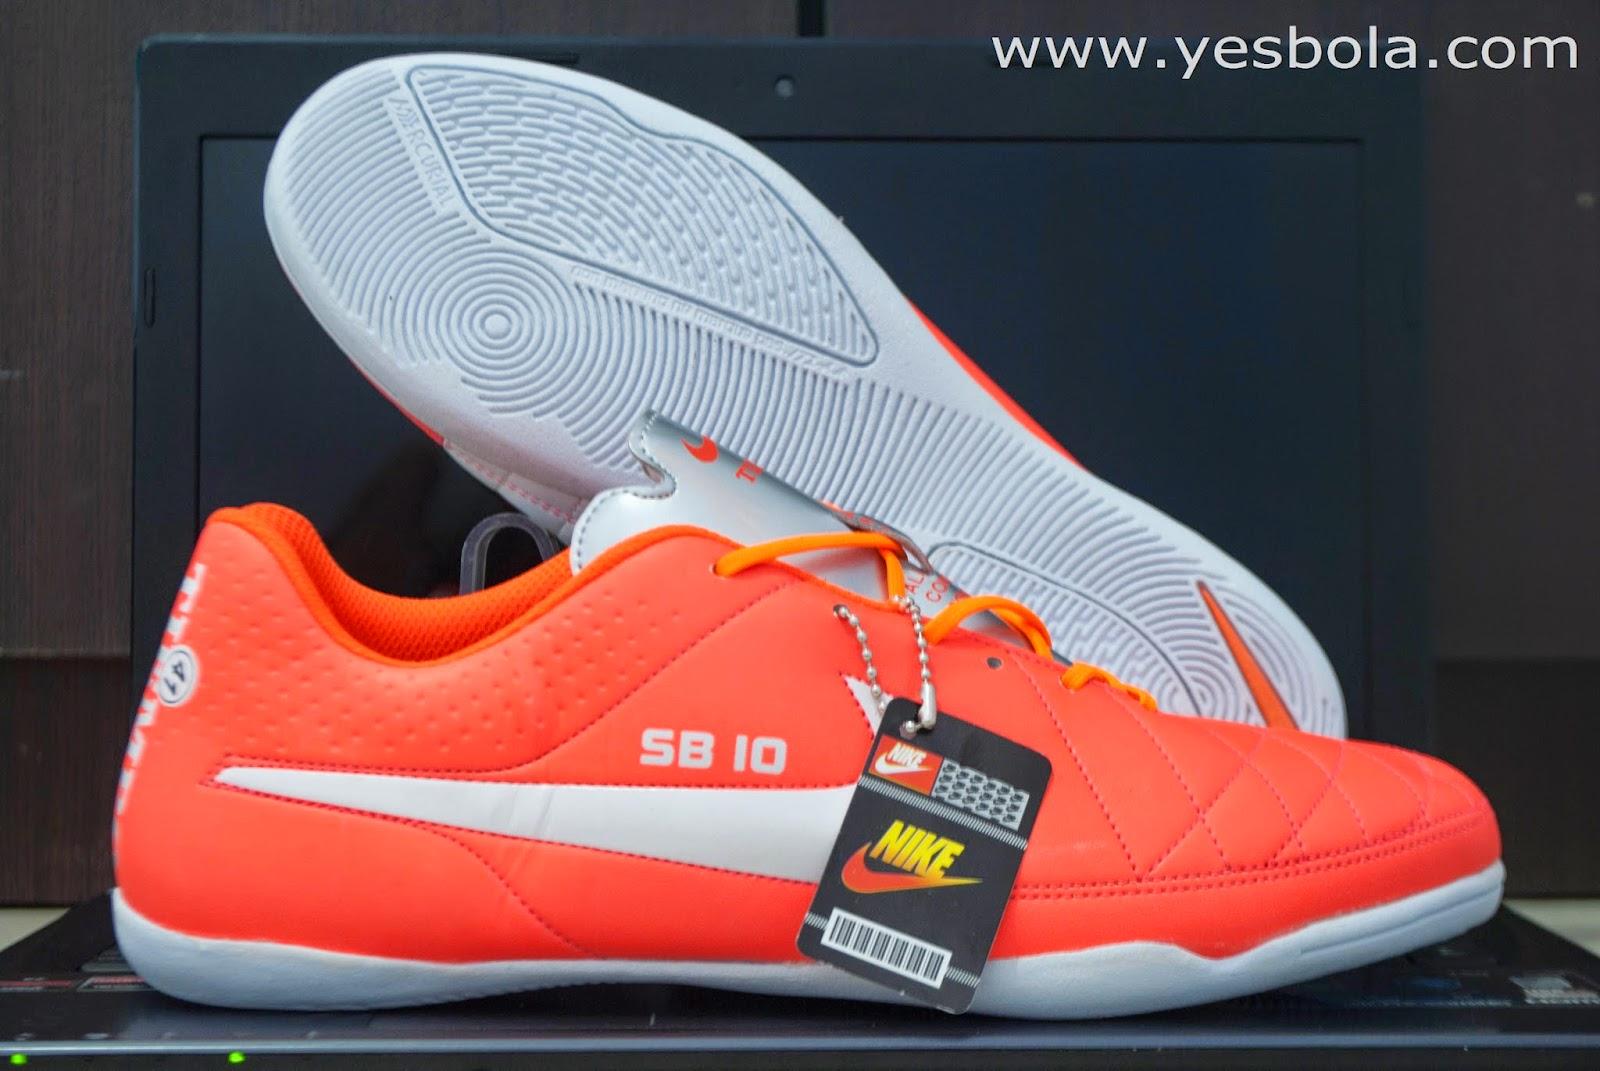 Jual Sepatu Futsal Nike Tiempo